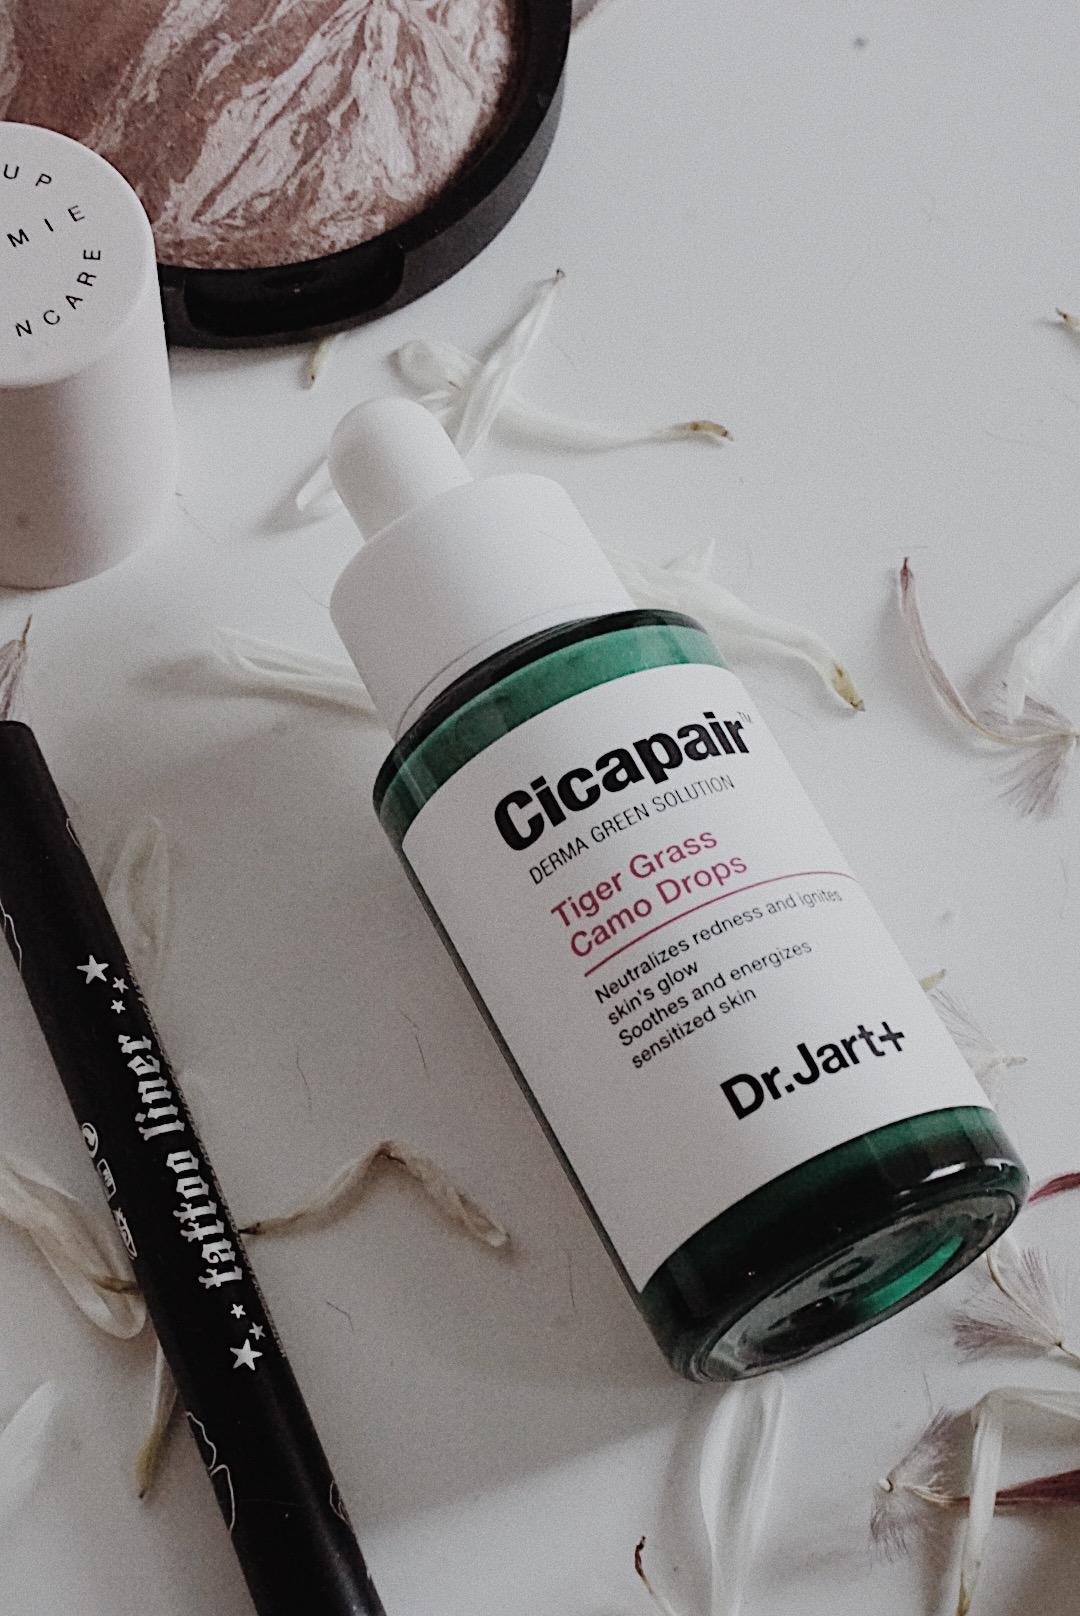 Makeup Look with Dr Jart Tiger Grass Camp Drops + Review